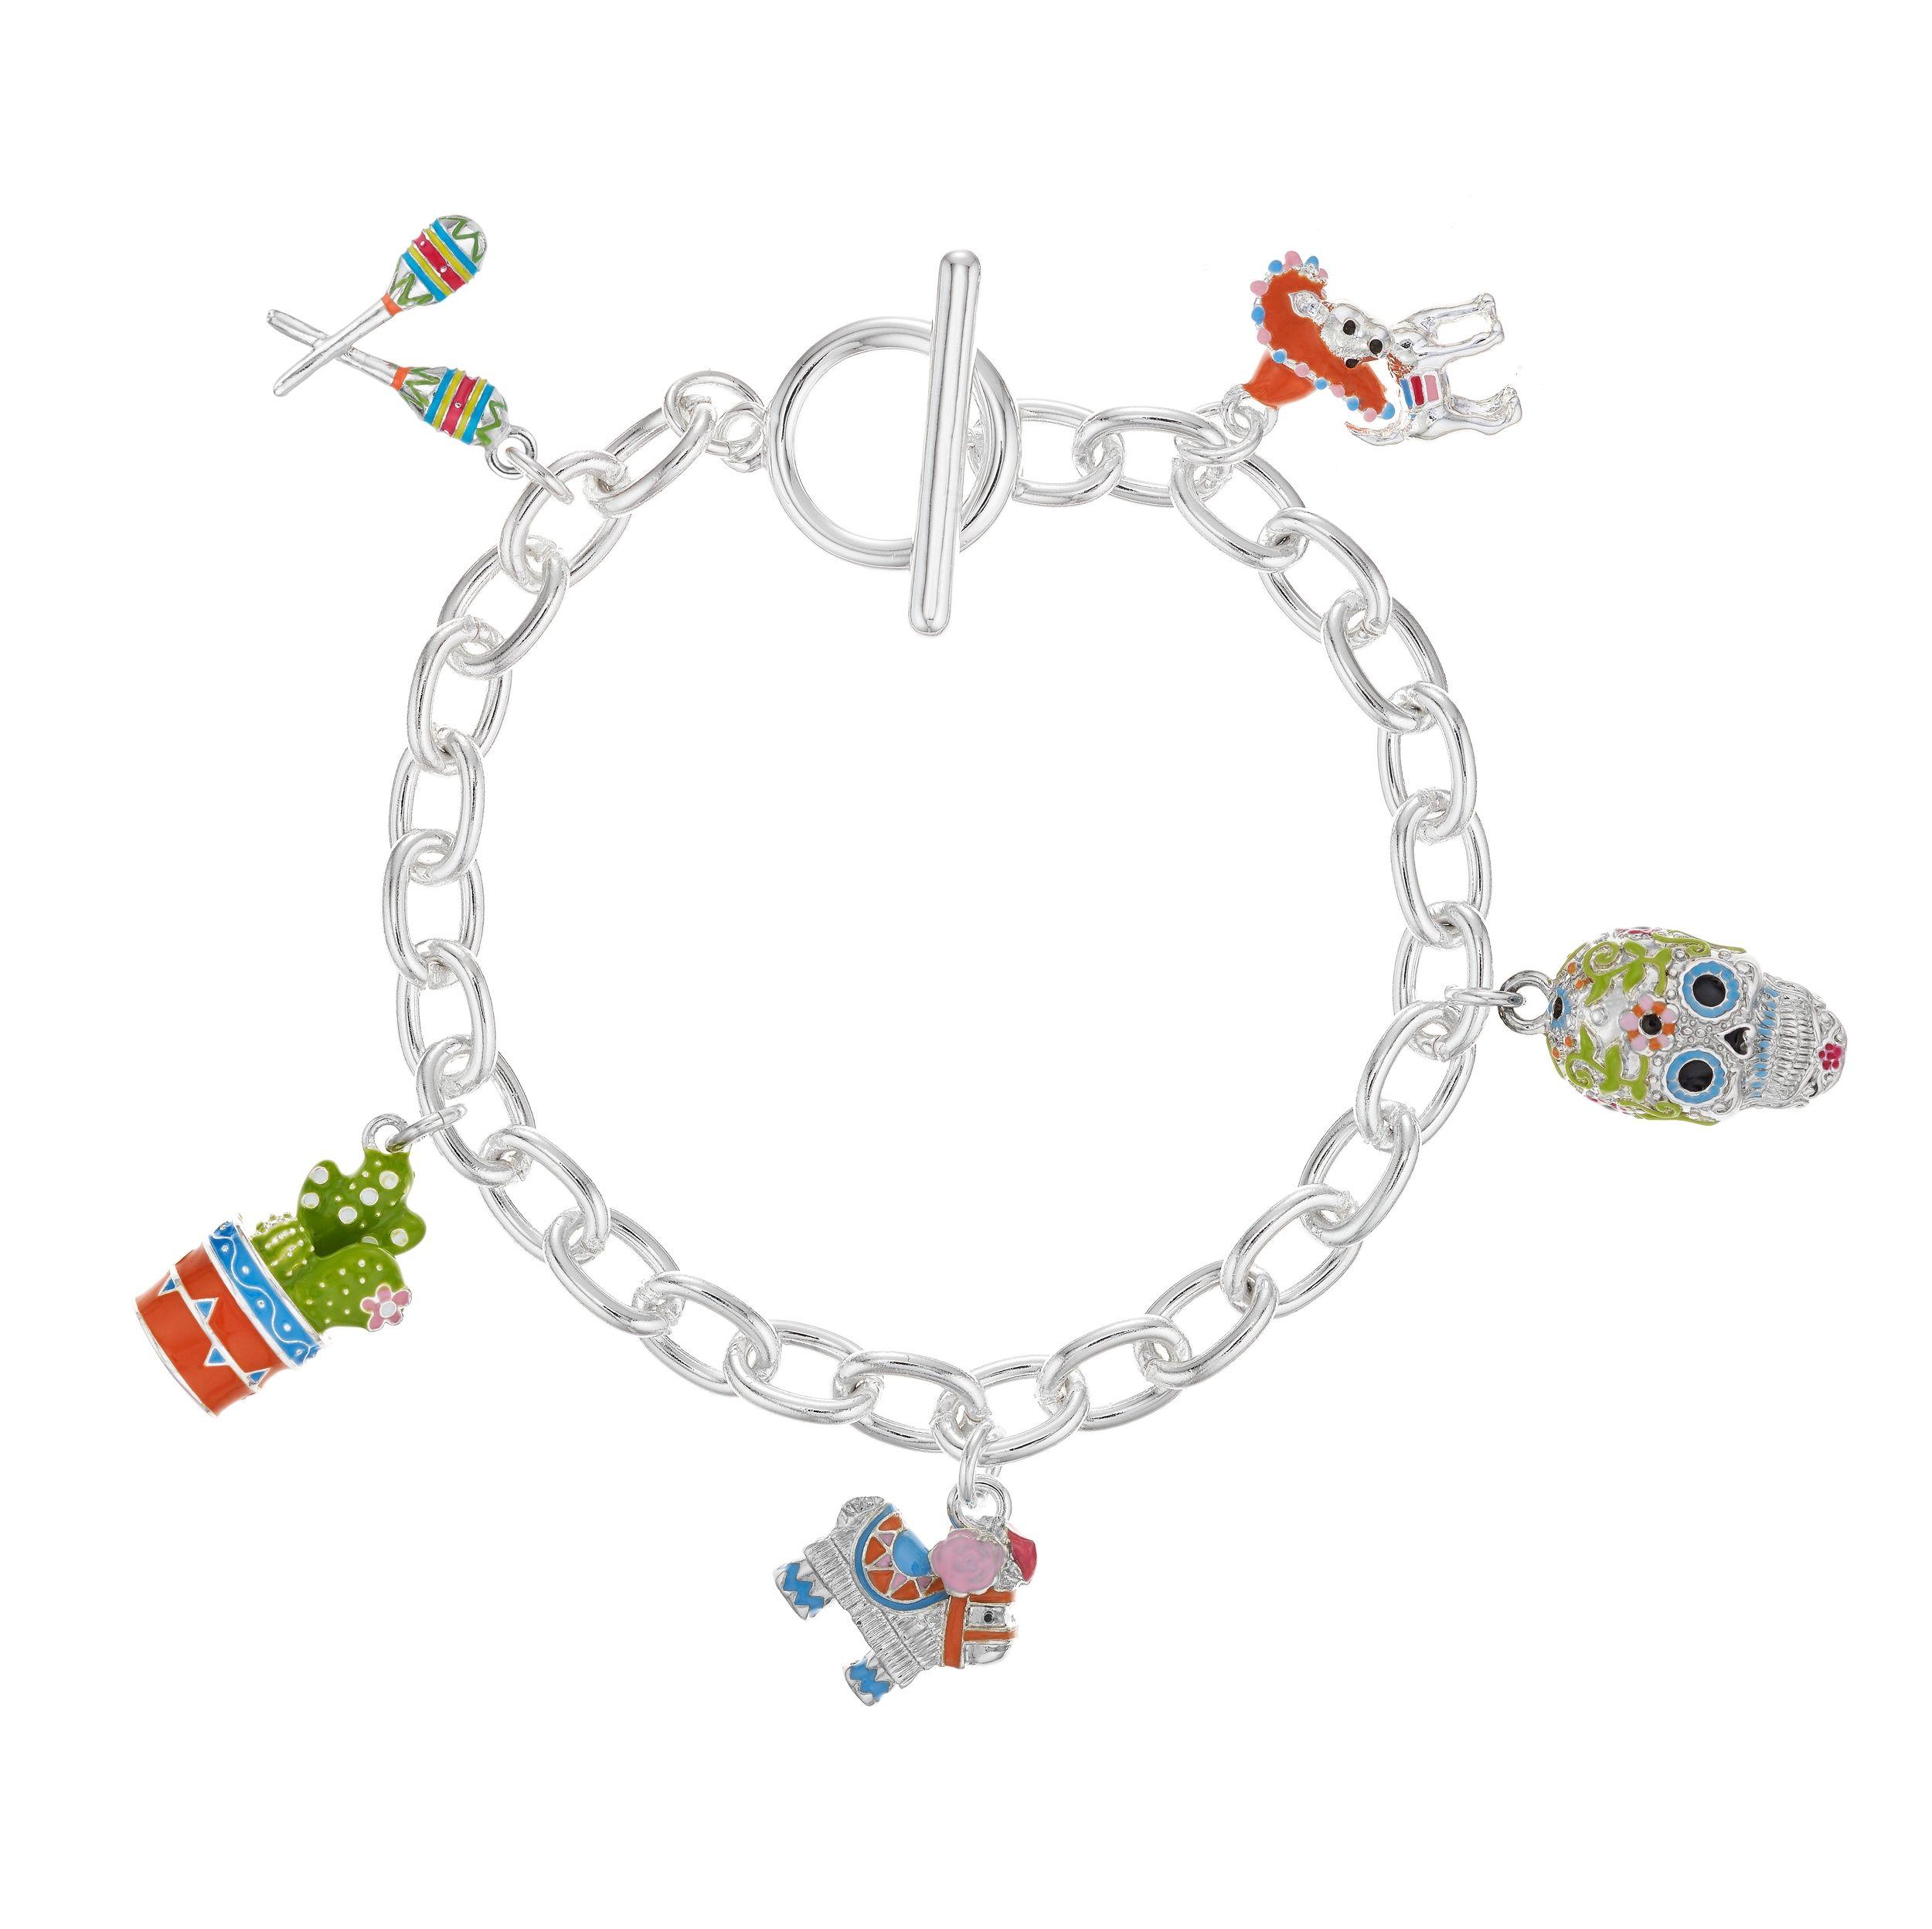 Buckley London Mexican Charm Bracelet